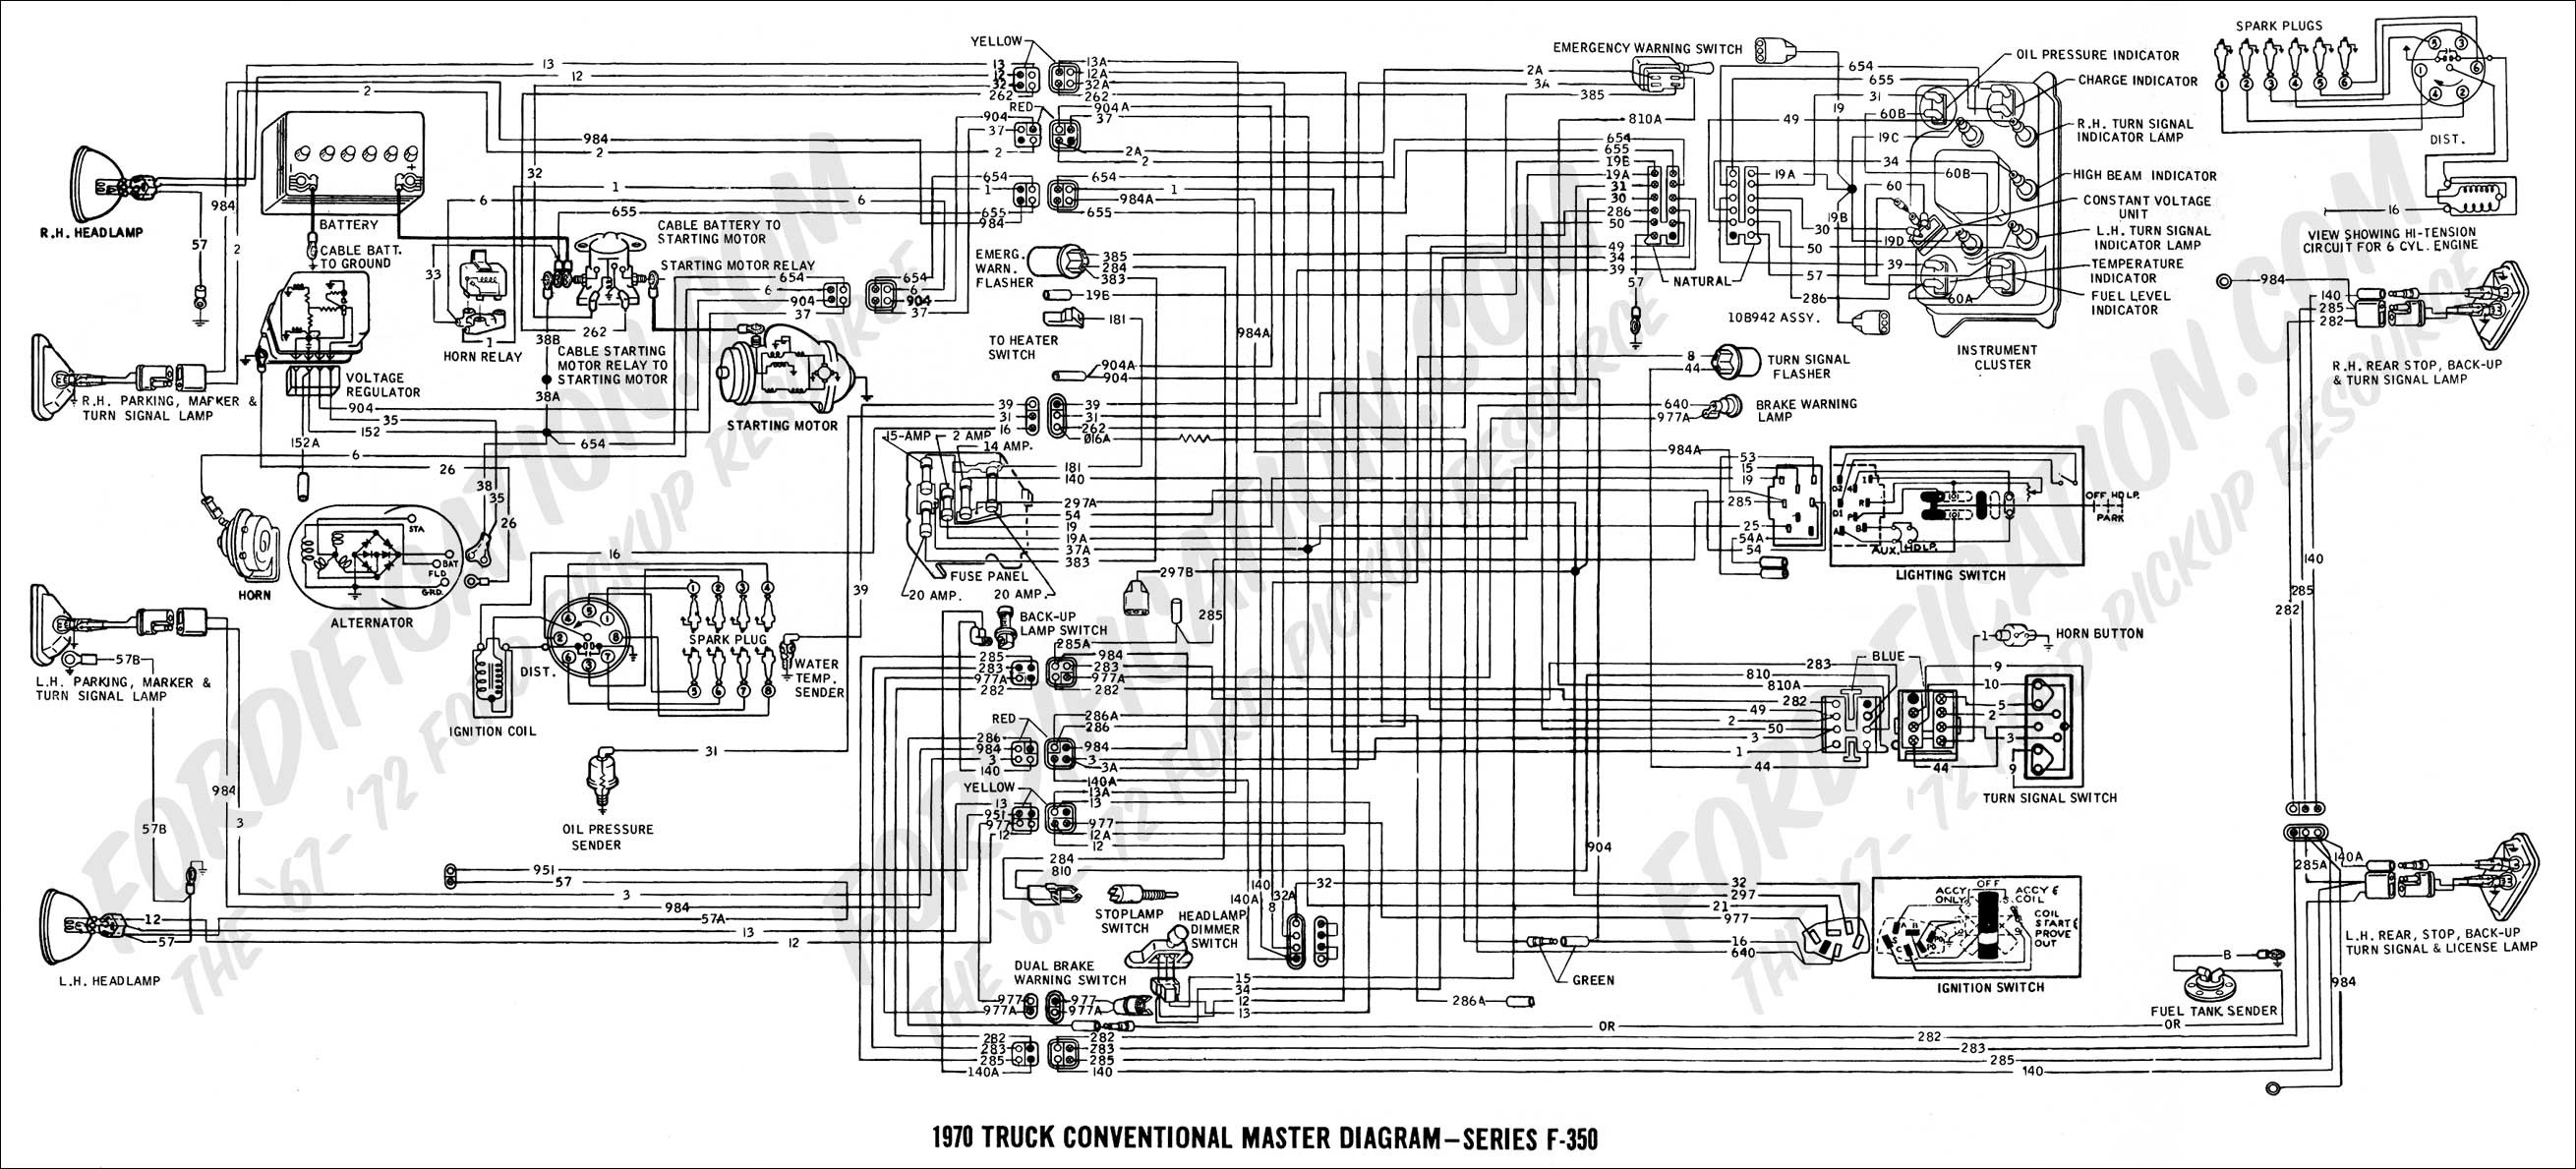 infiniti j30 radio wiring diagram - wiring diagram overview series-court -  series-court.aigaravenna.it  aigaravenna.it